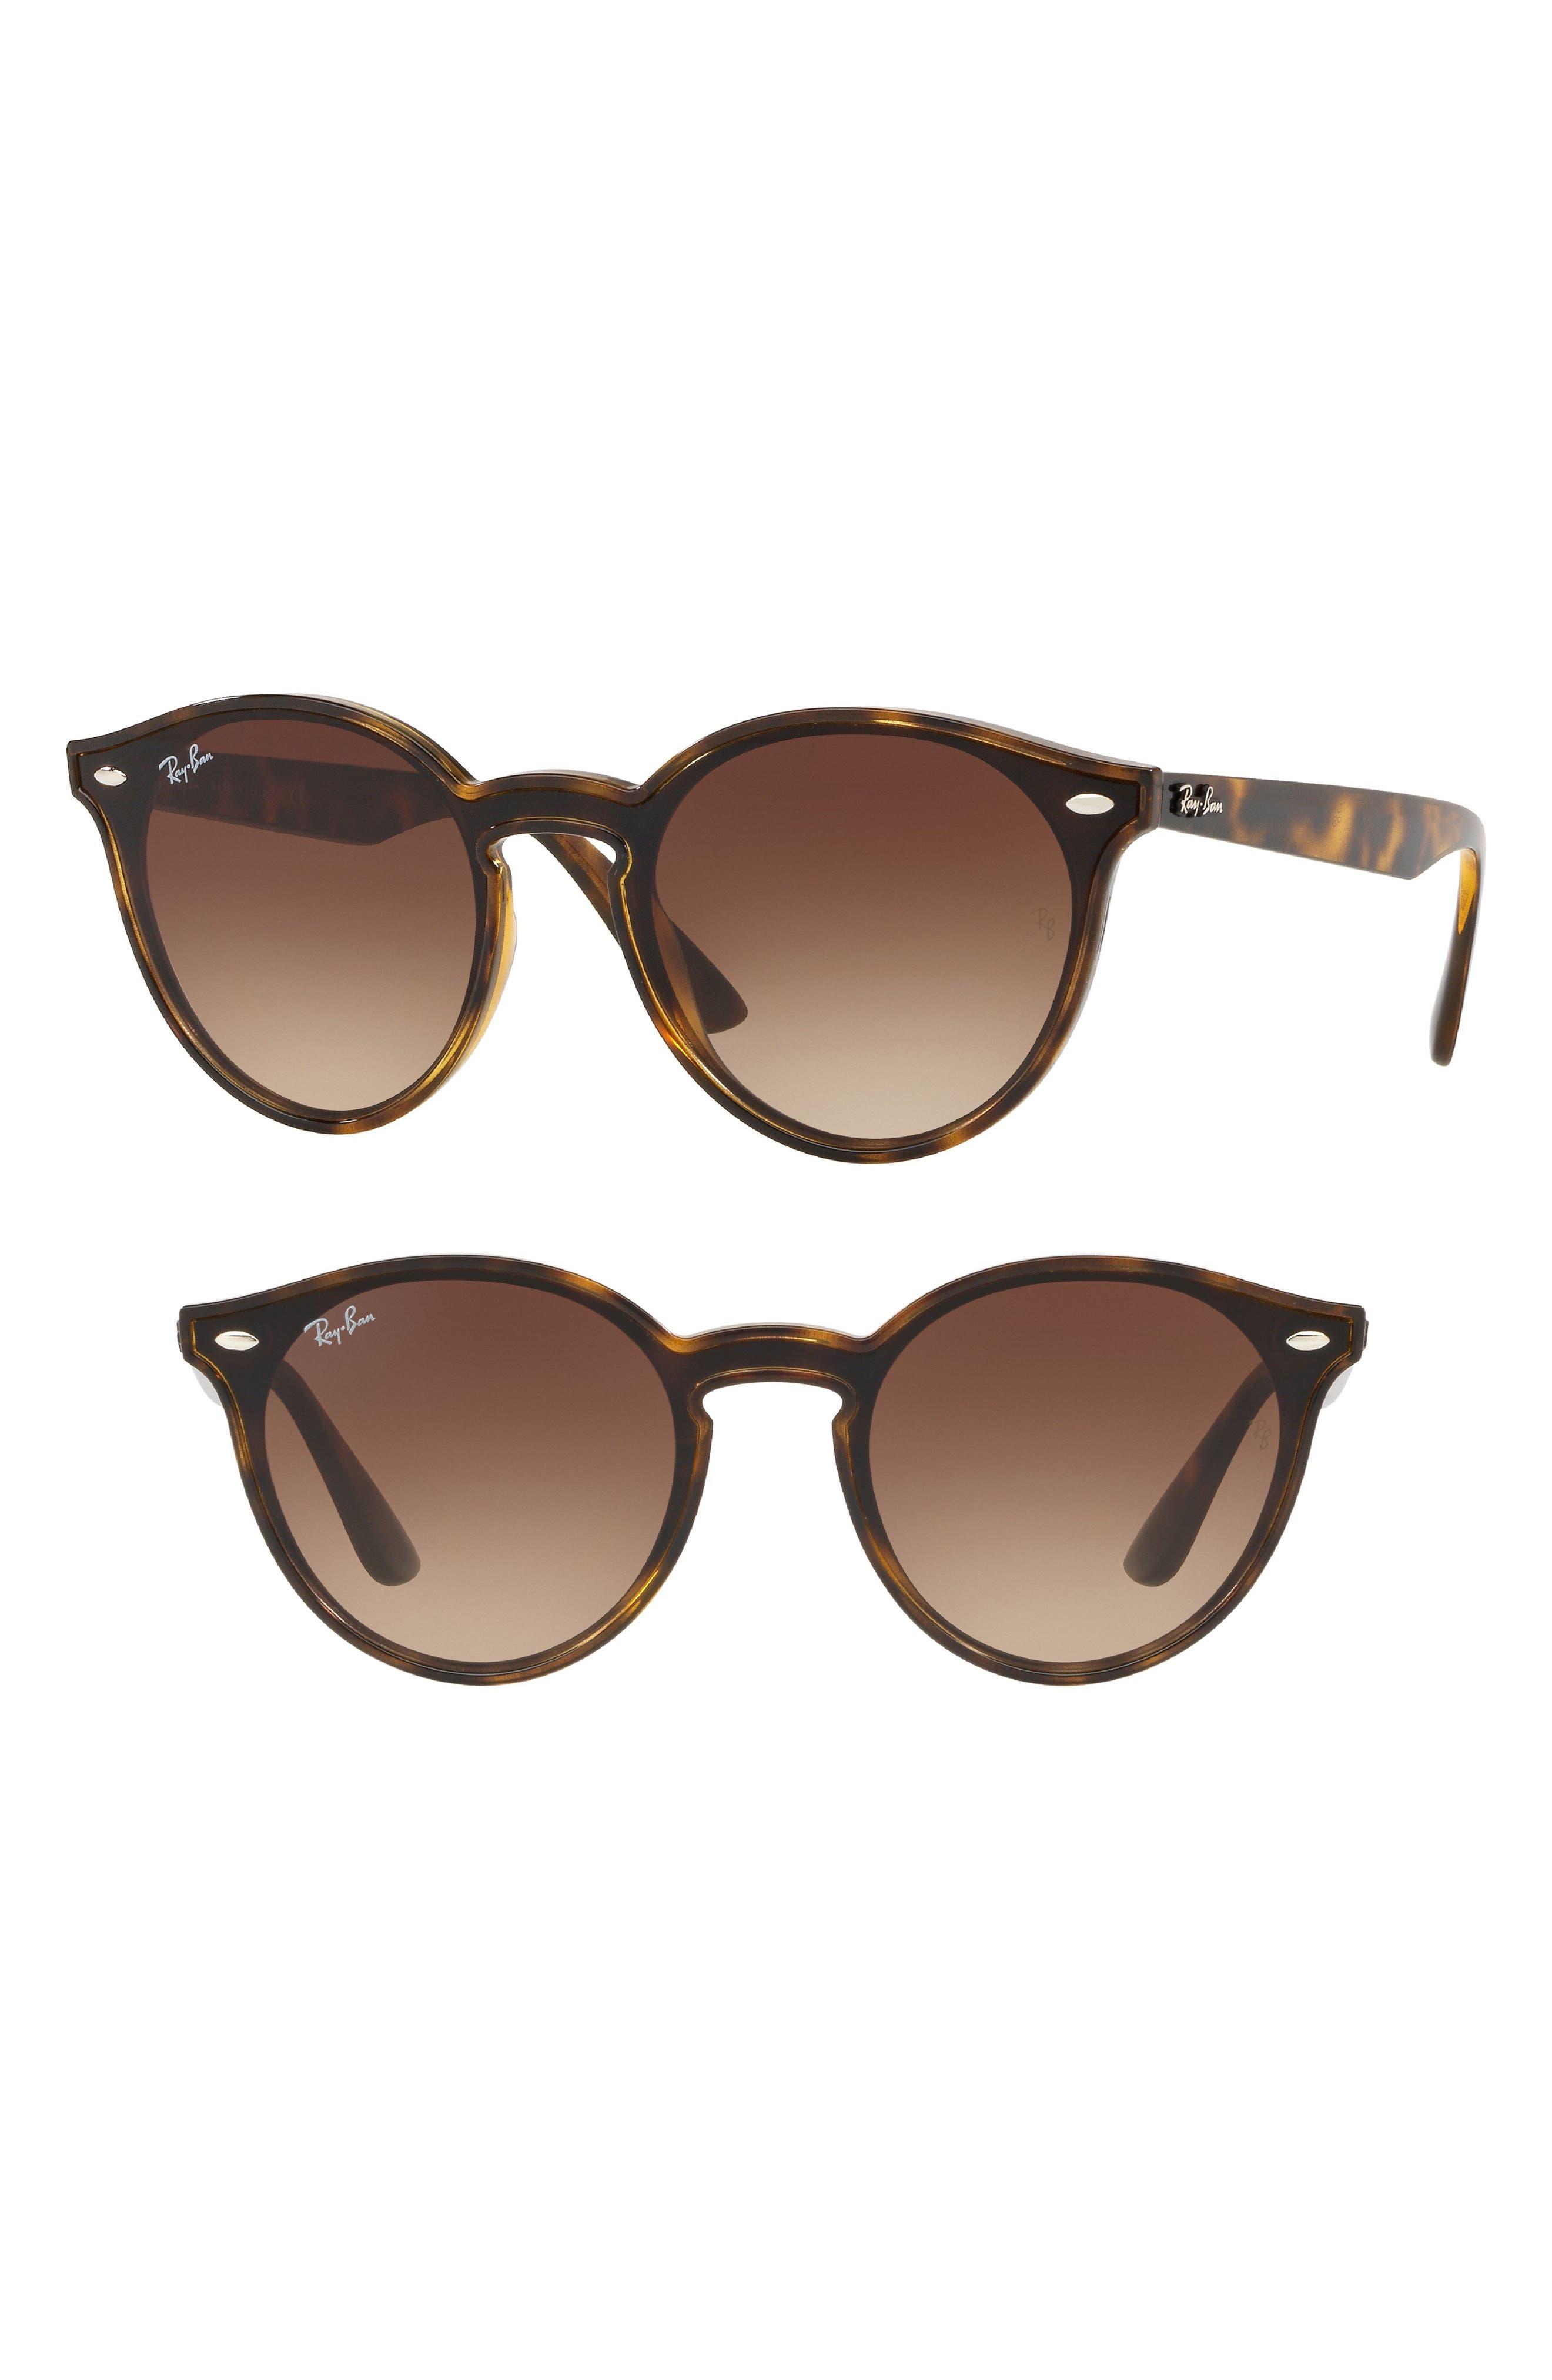 RAY-BAN, Blaze 37mm Round Sunglasses, Main thumbnail 1, color, LIGHT HAVANA GRADIENT